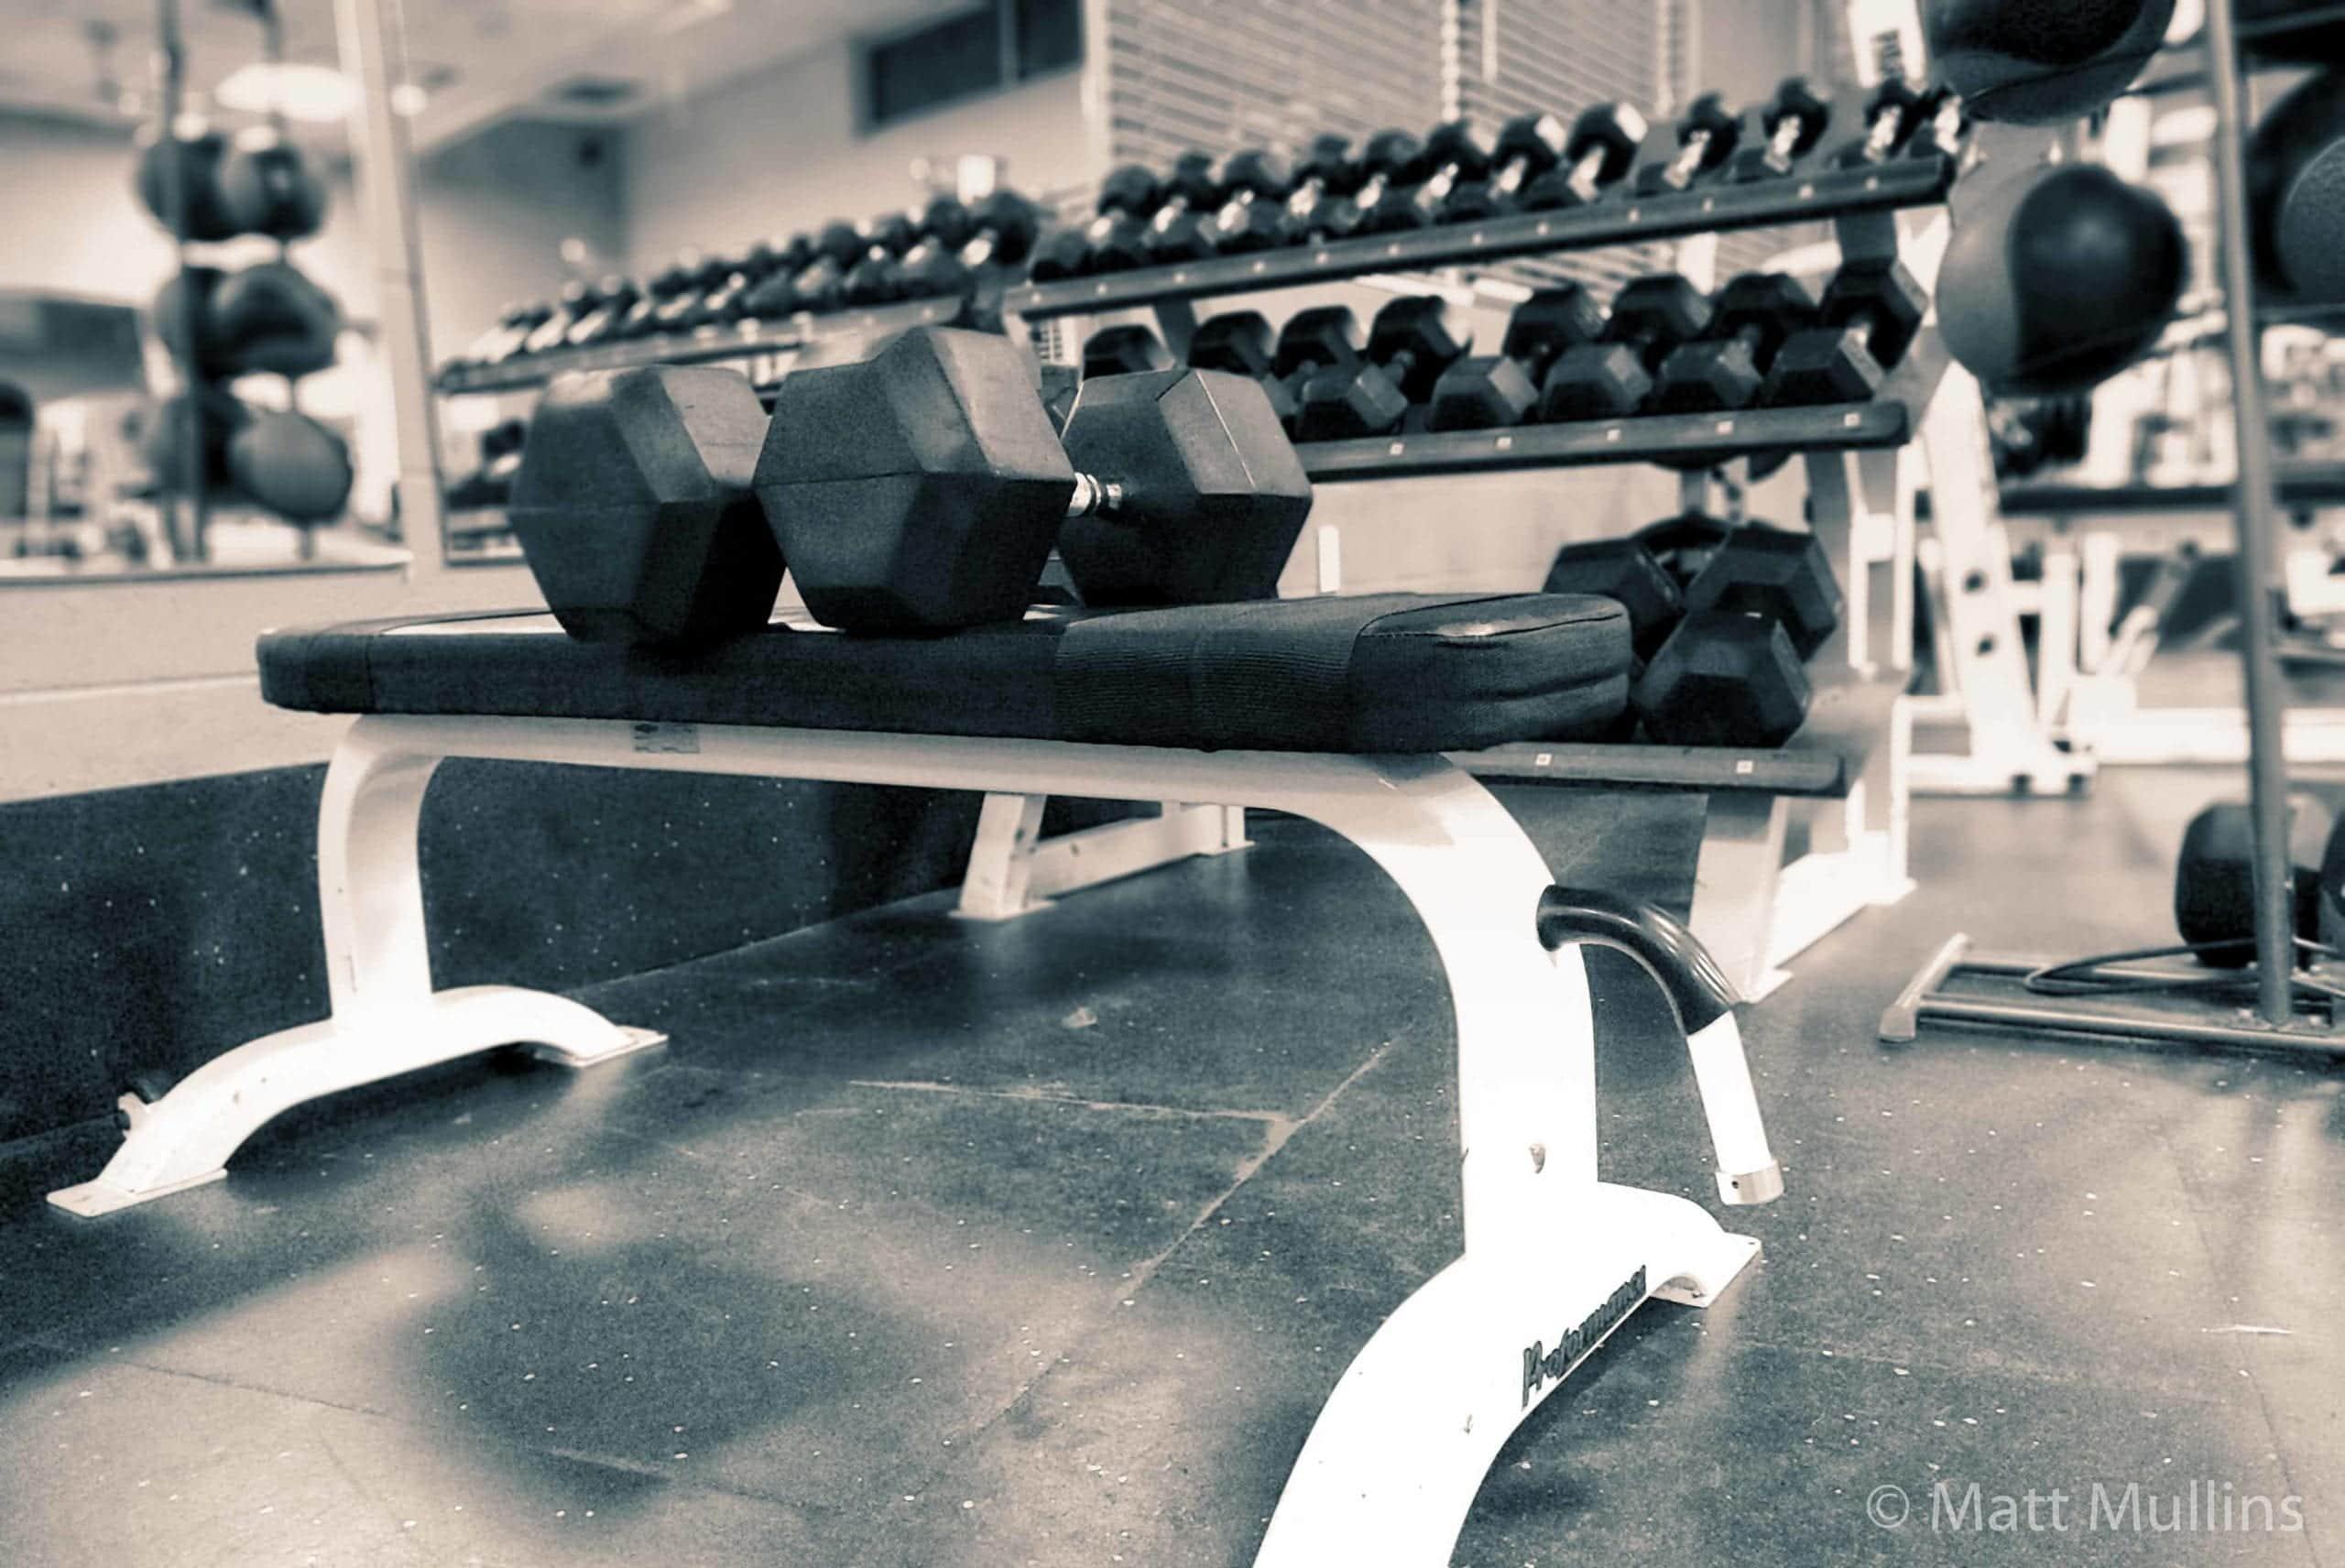 TuffStuff Proformance Flat Workout Bench